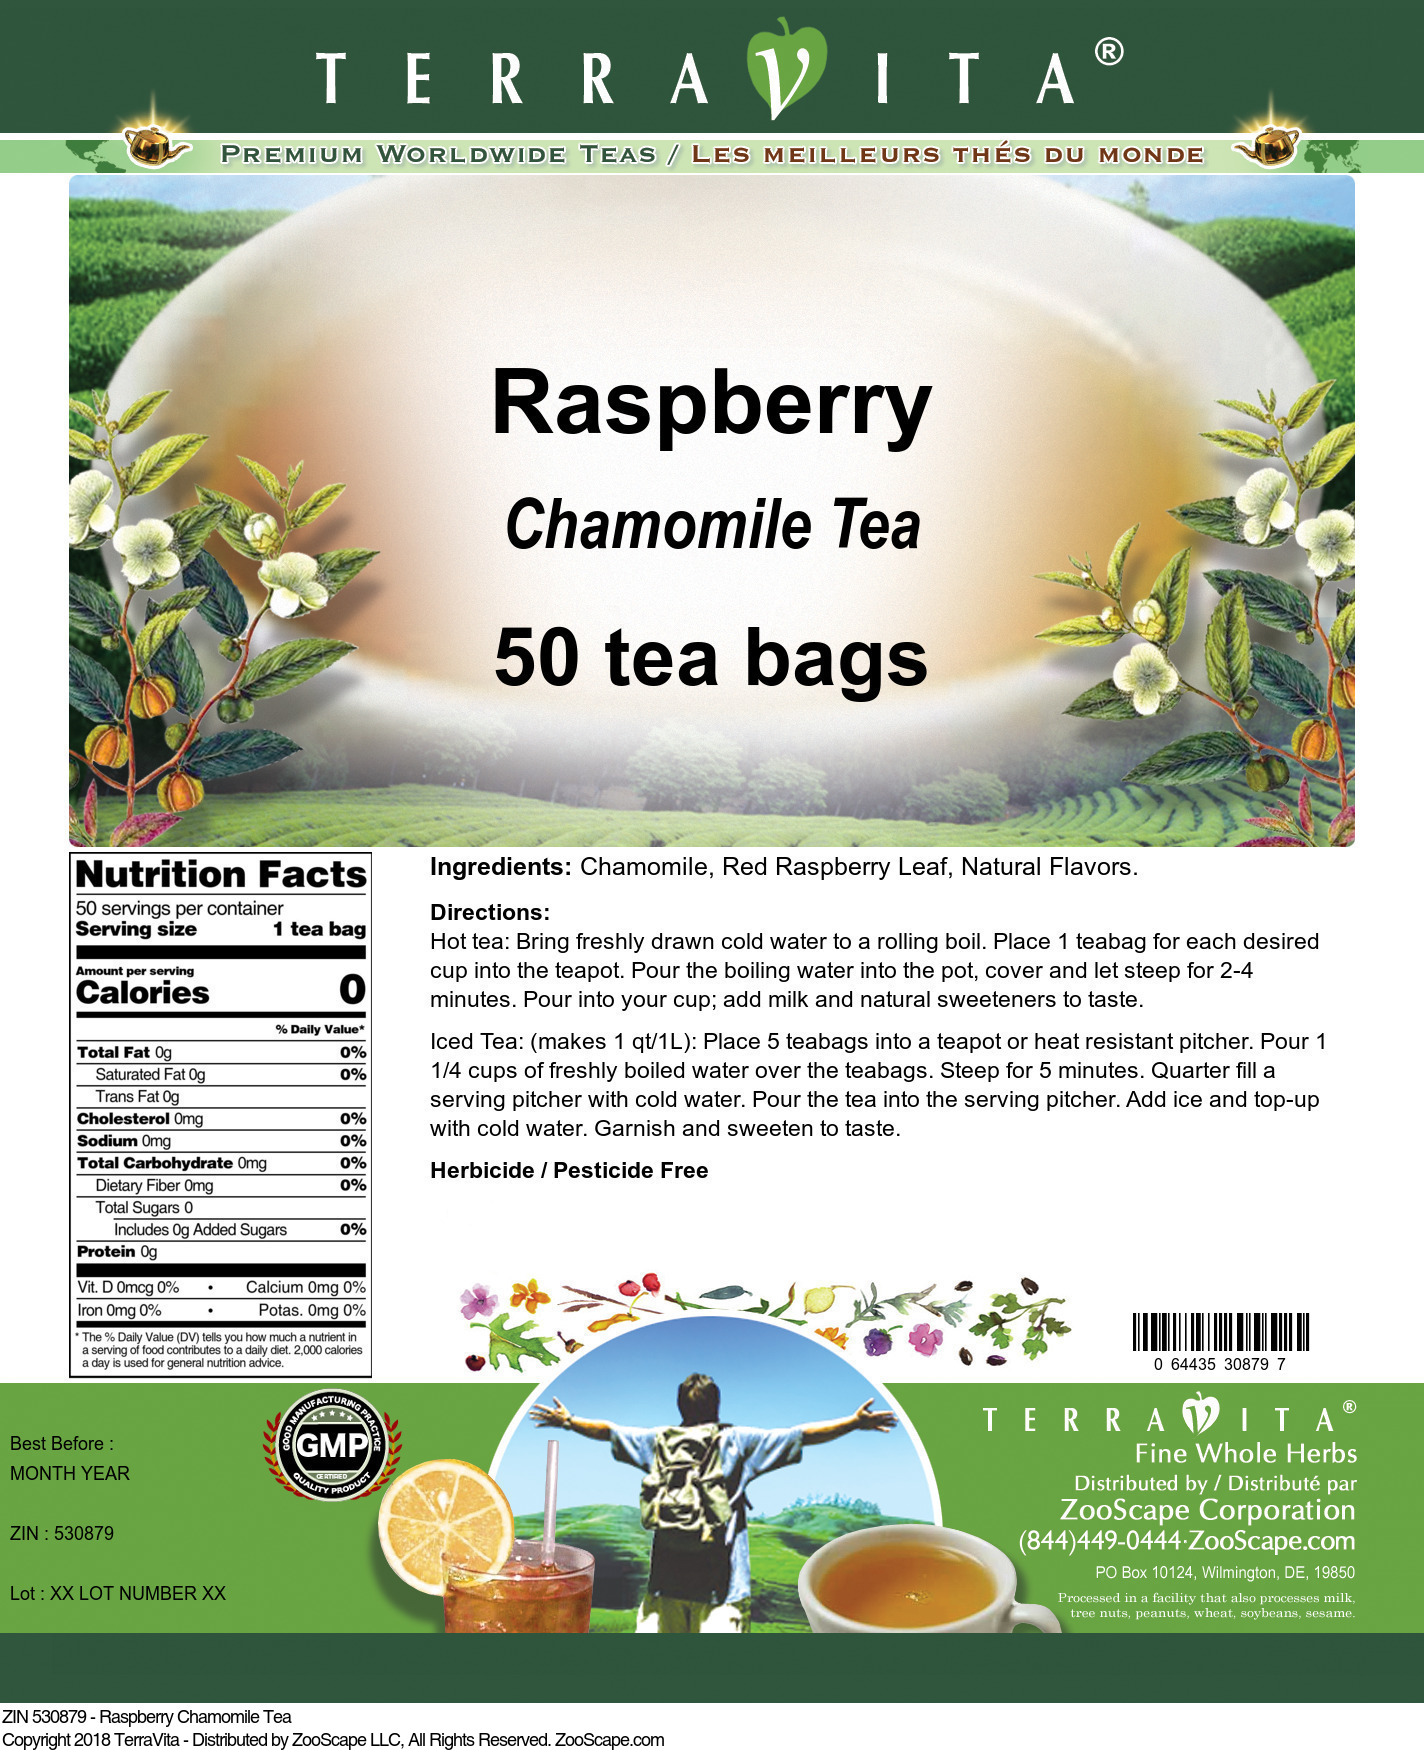 Raspberry Chamomile Tea